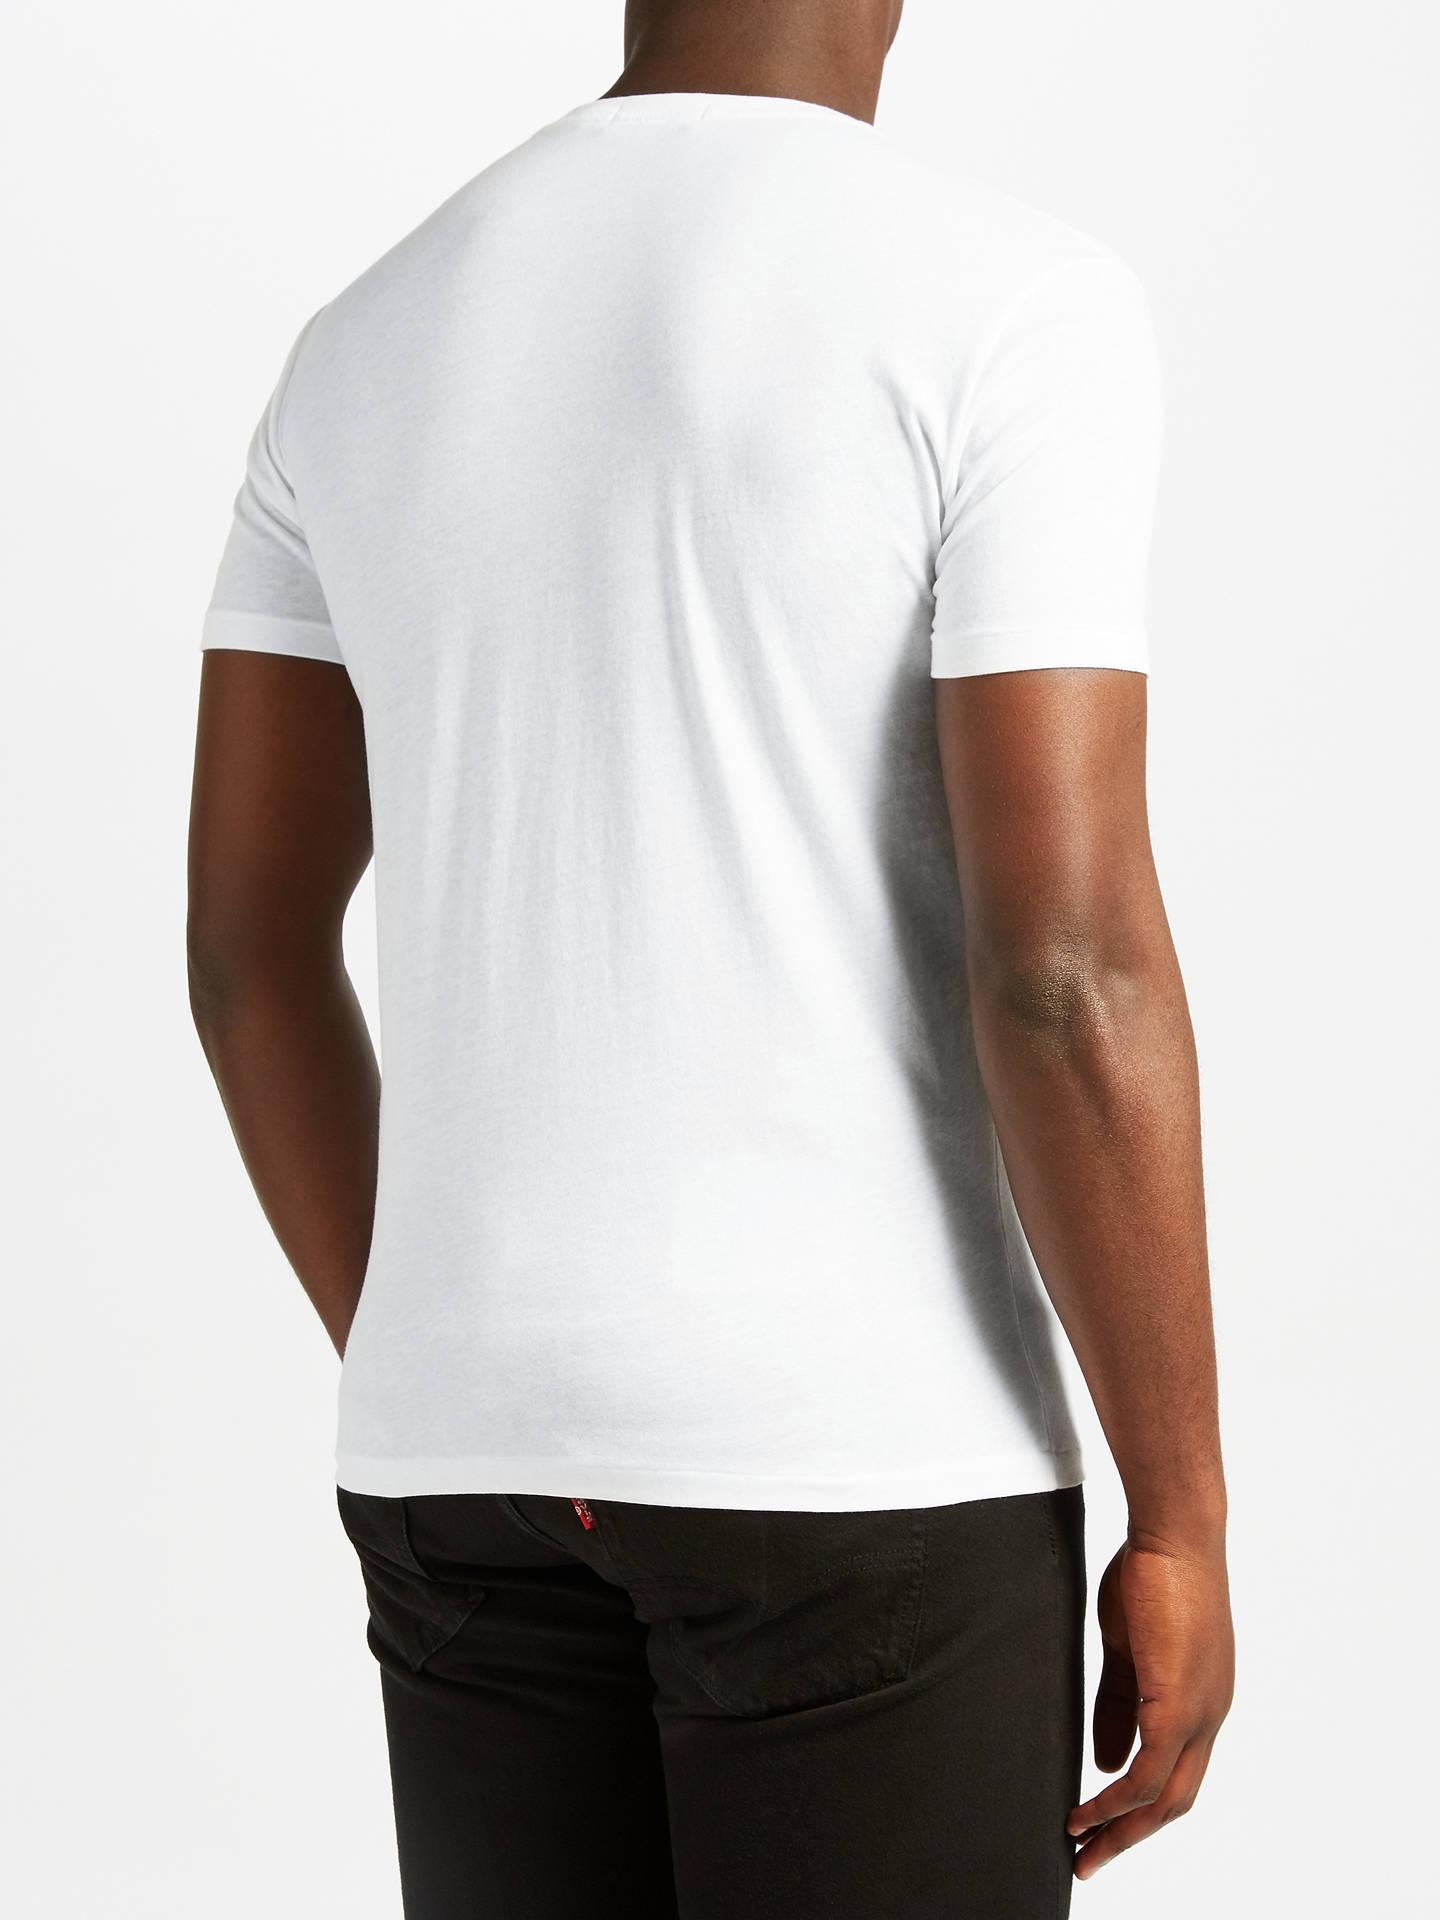 ee35f7adeb Polo Ralph Lauren V-Neck T-Shirt, White at John Lewis & Partners